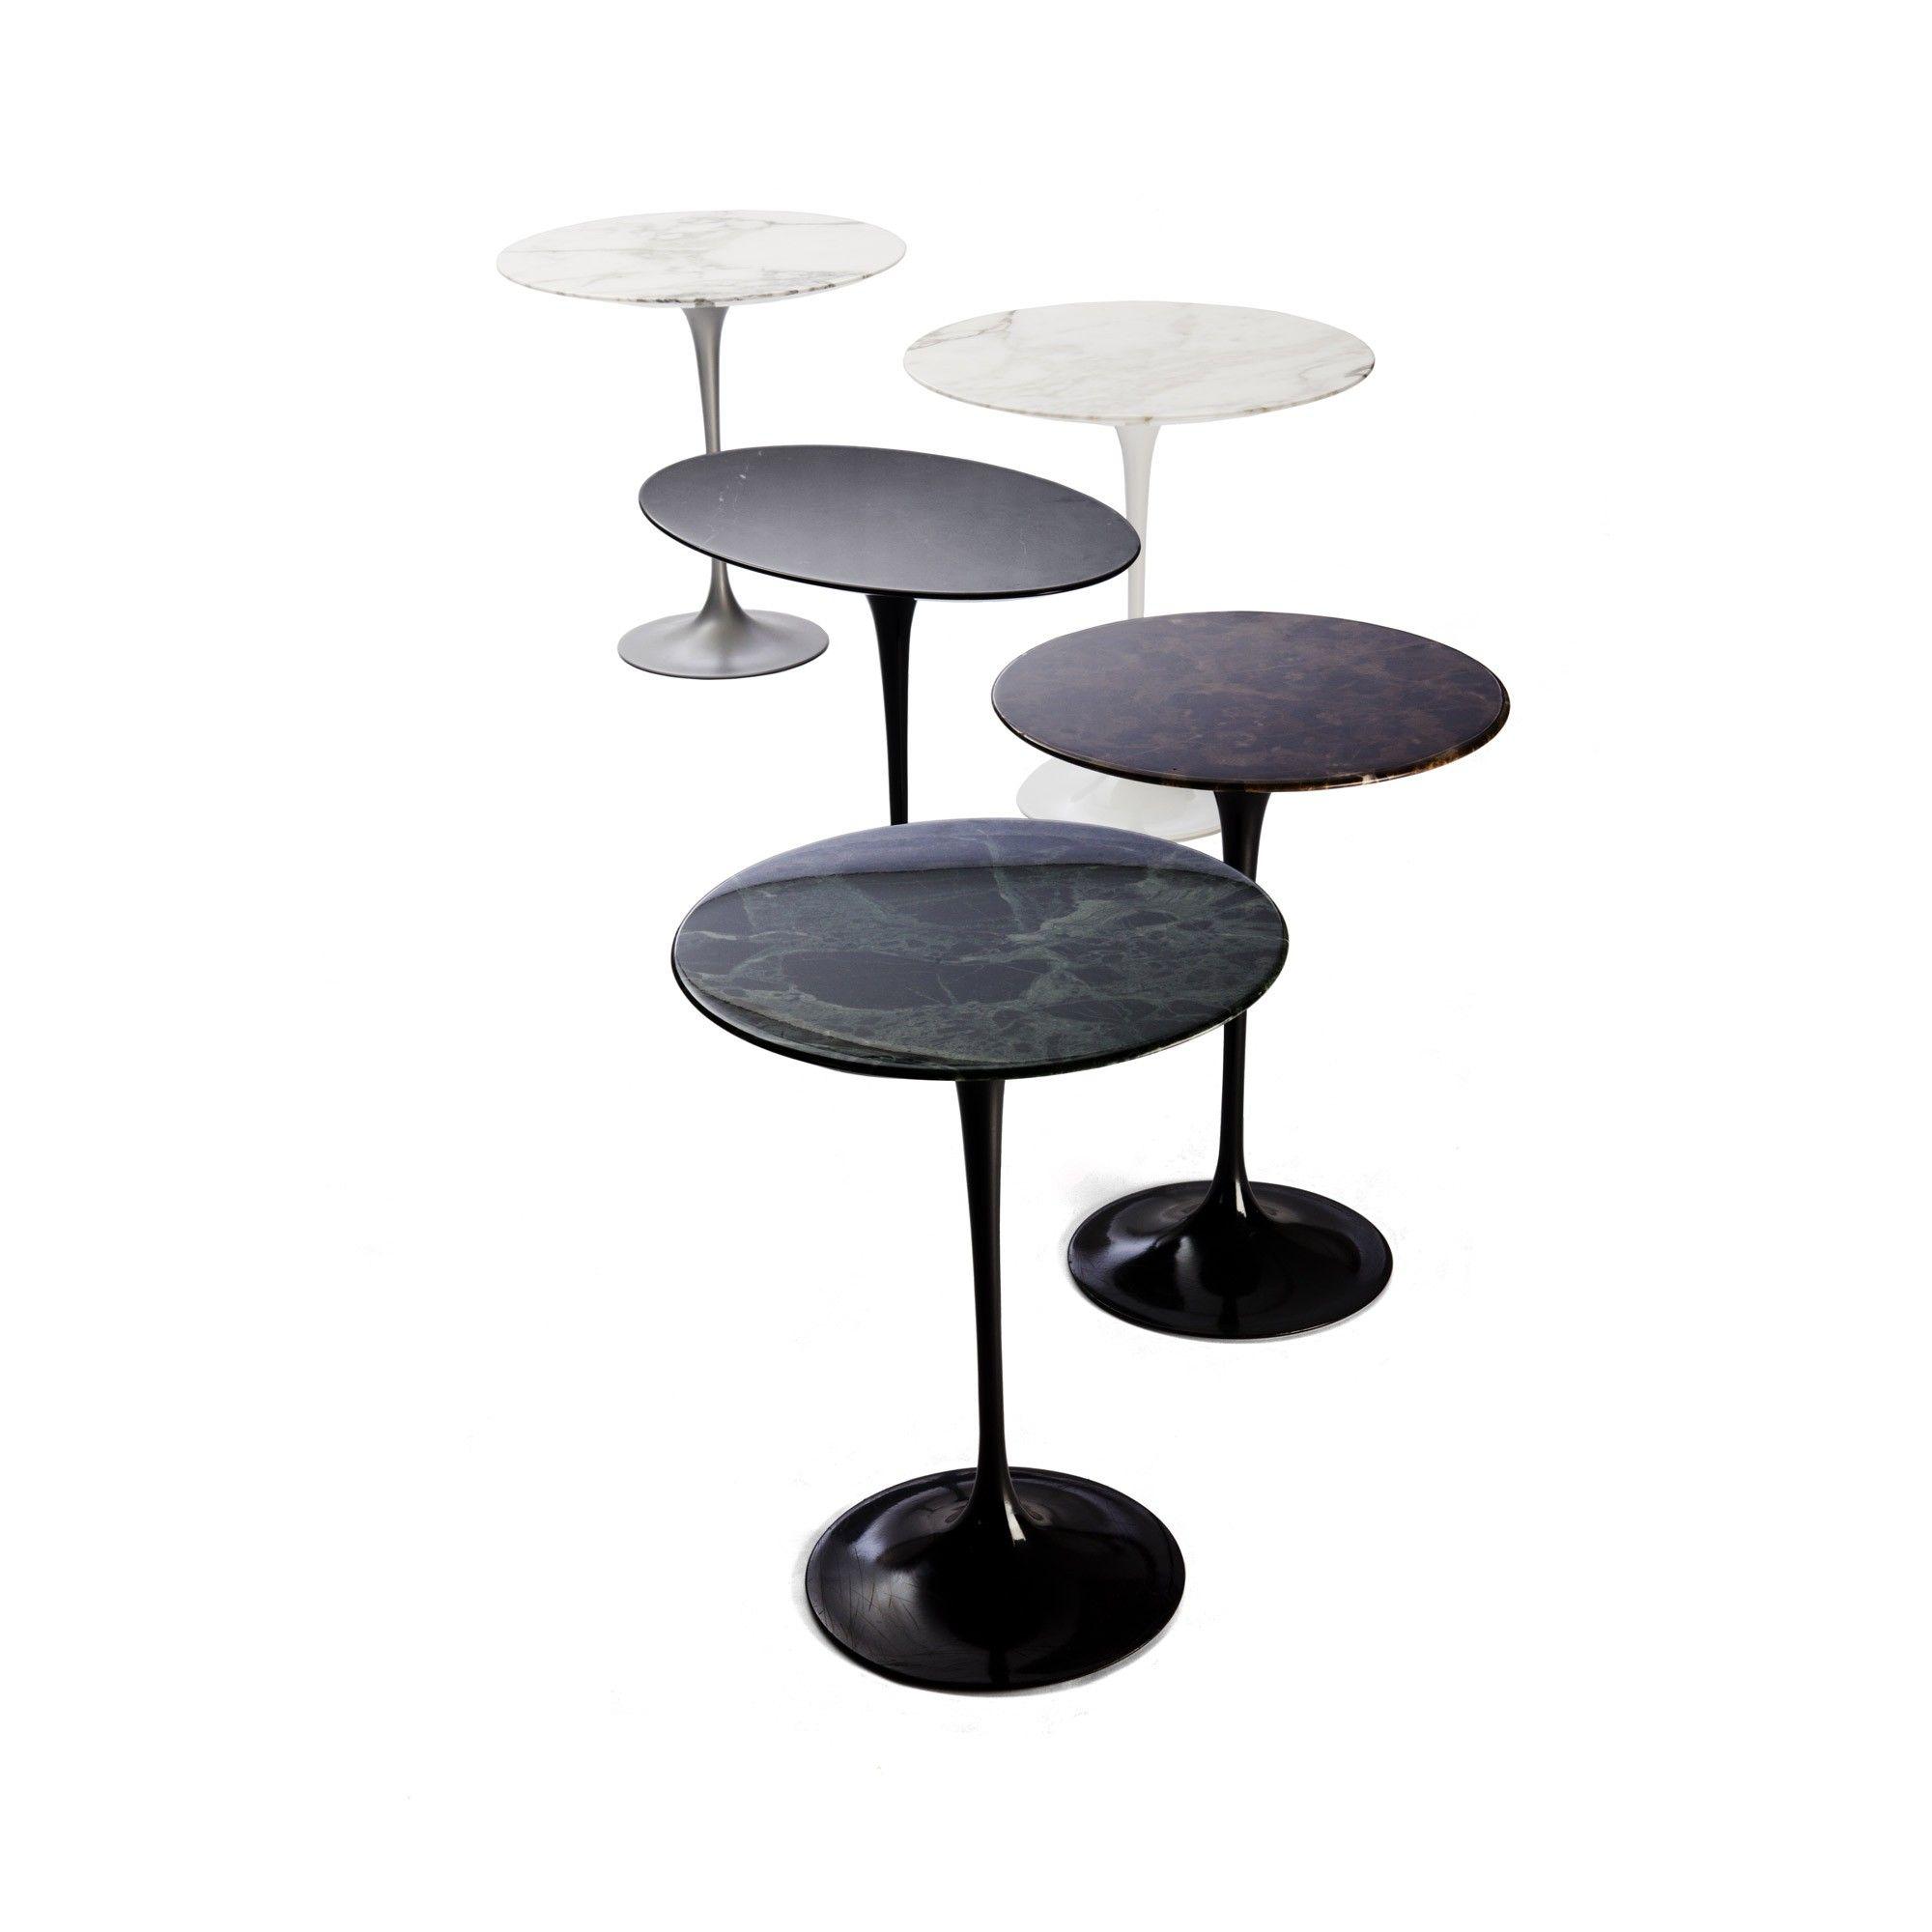 Saarinen coffee table Quickship salento mobili